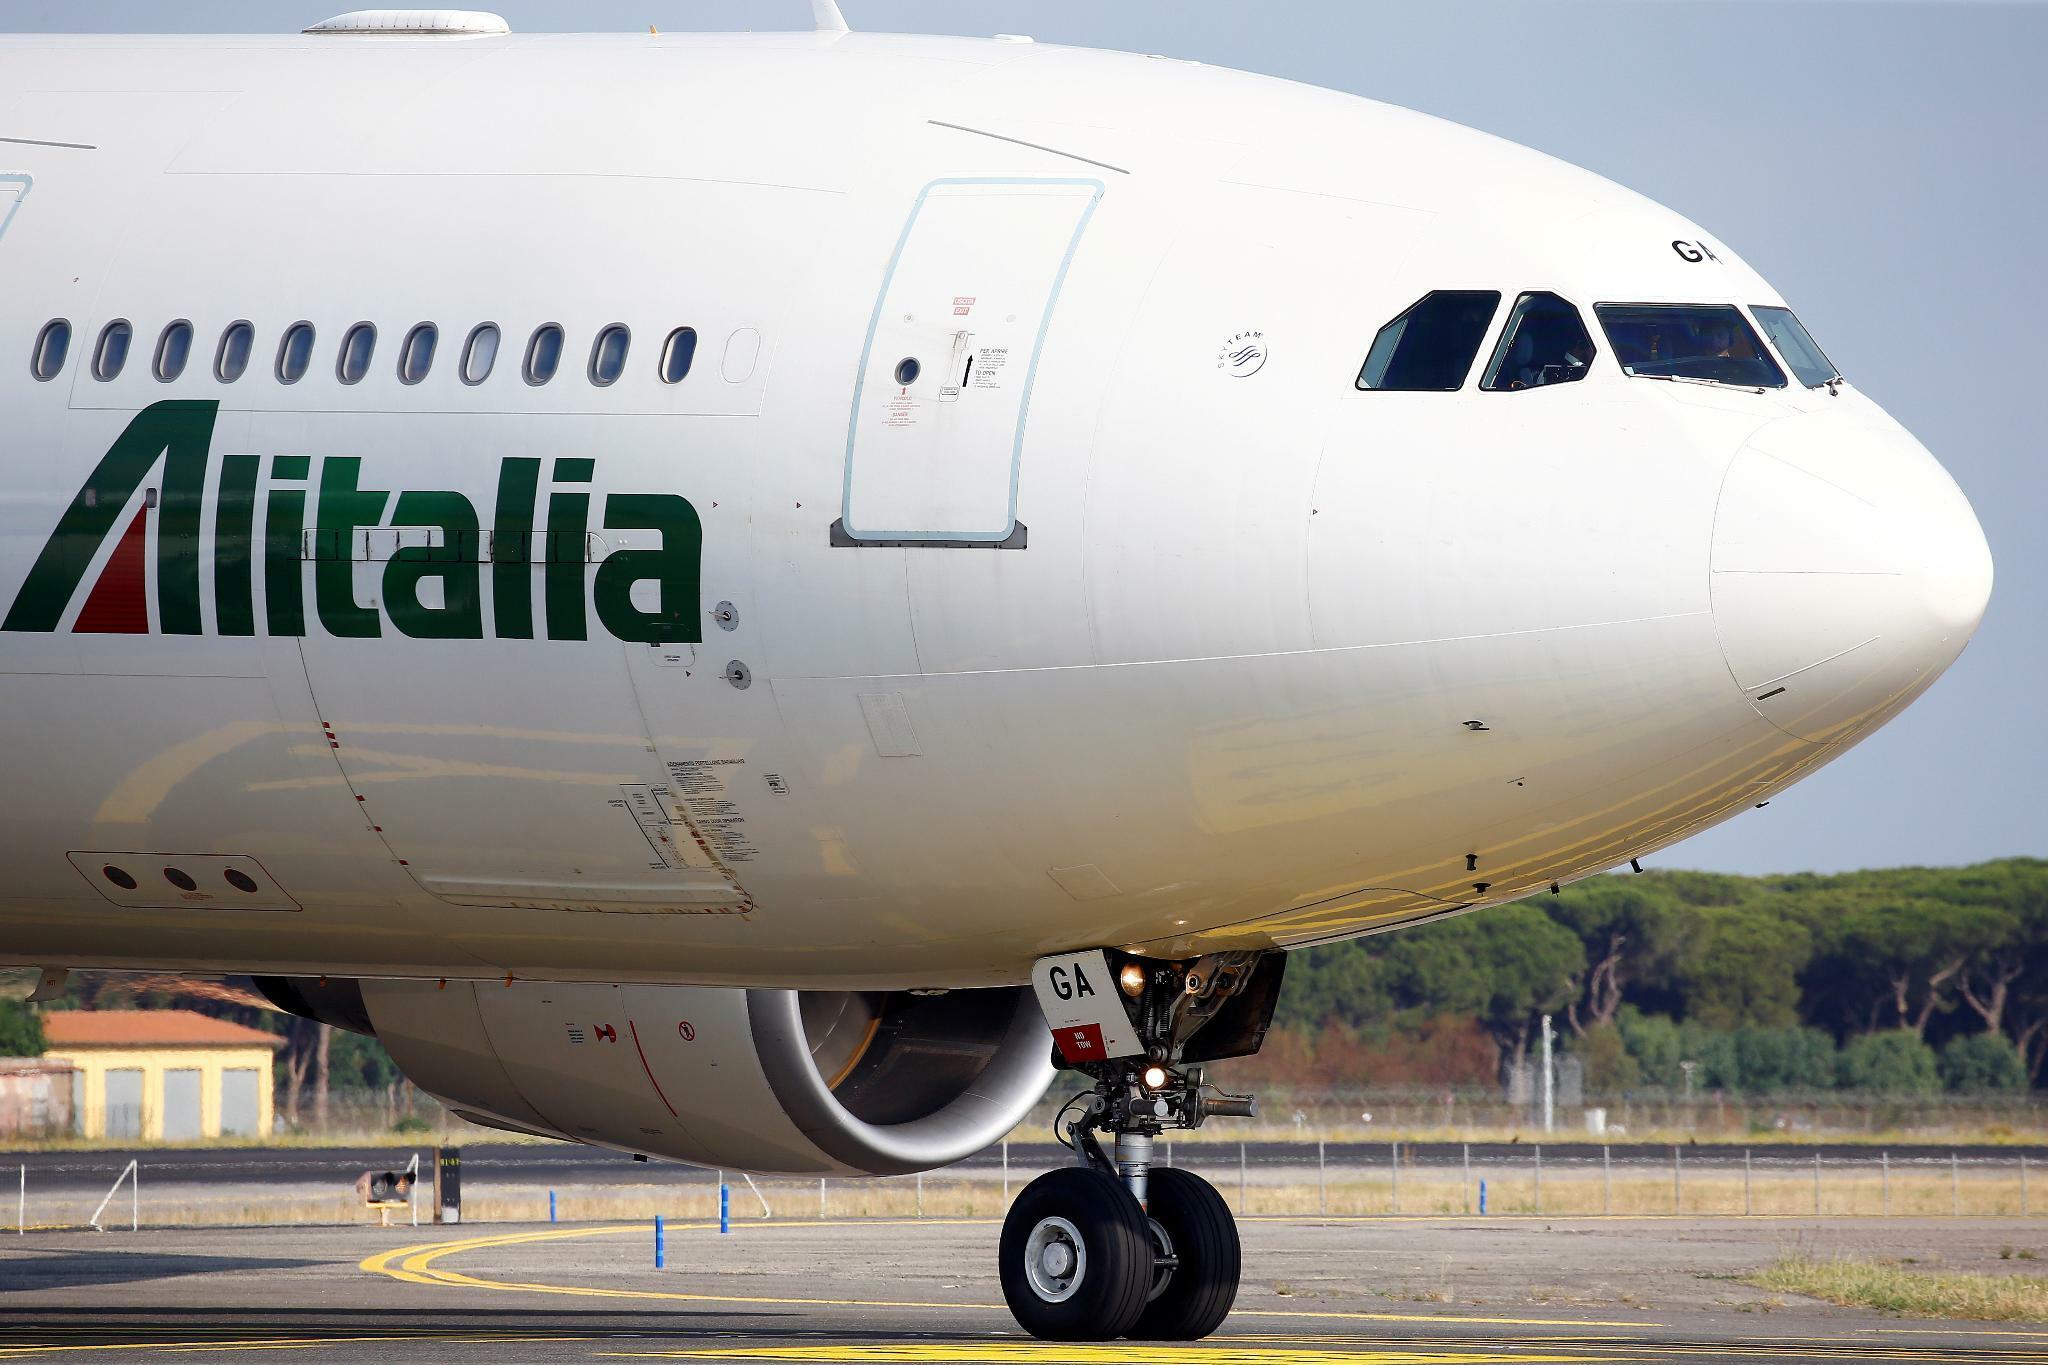 Fluggesellschaft: Atlantia erteilt Konsortium für Alitalia-Rettung Absage